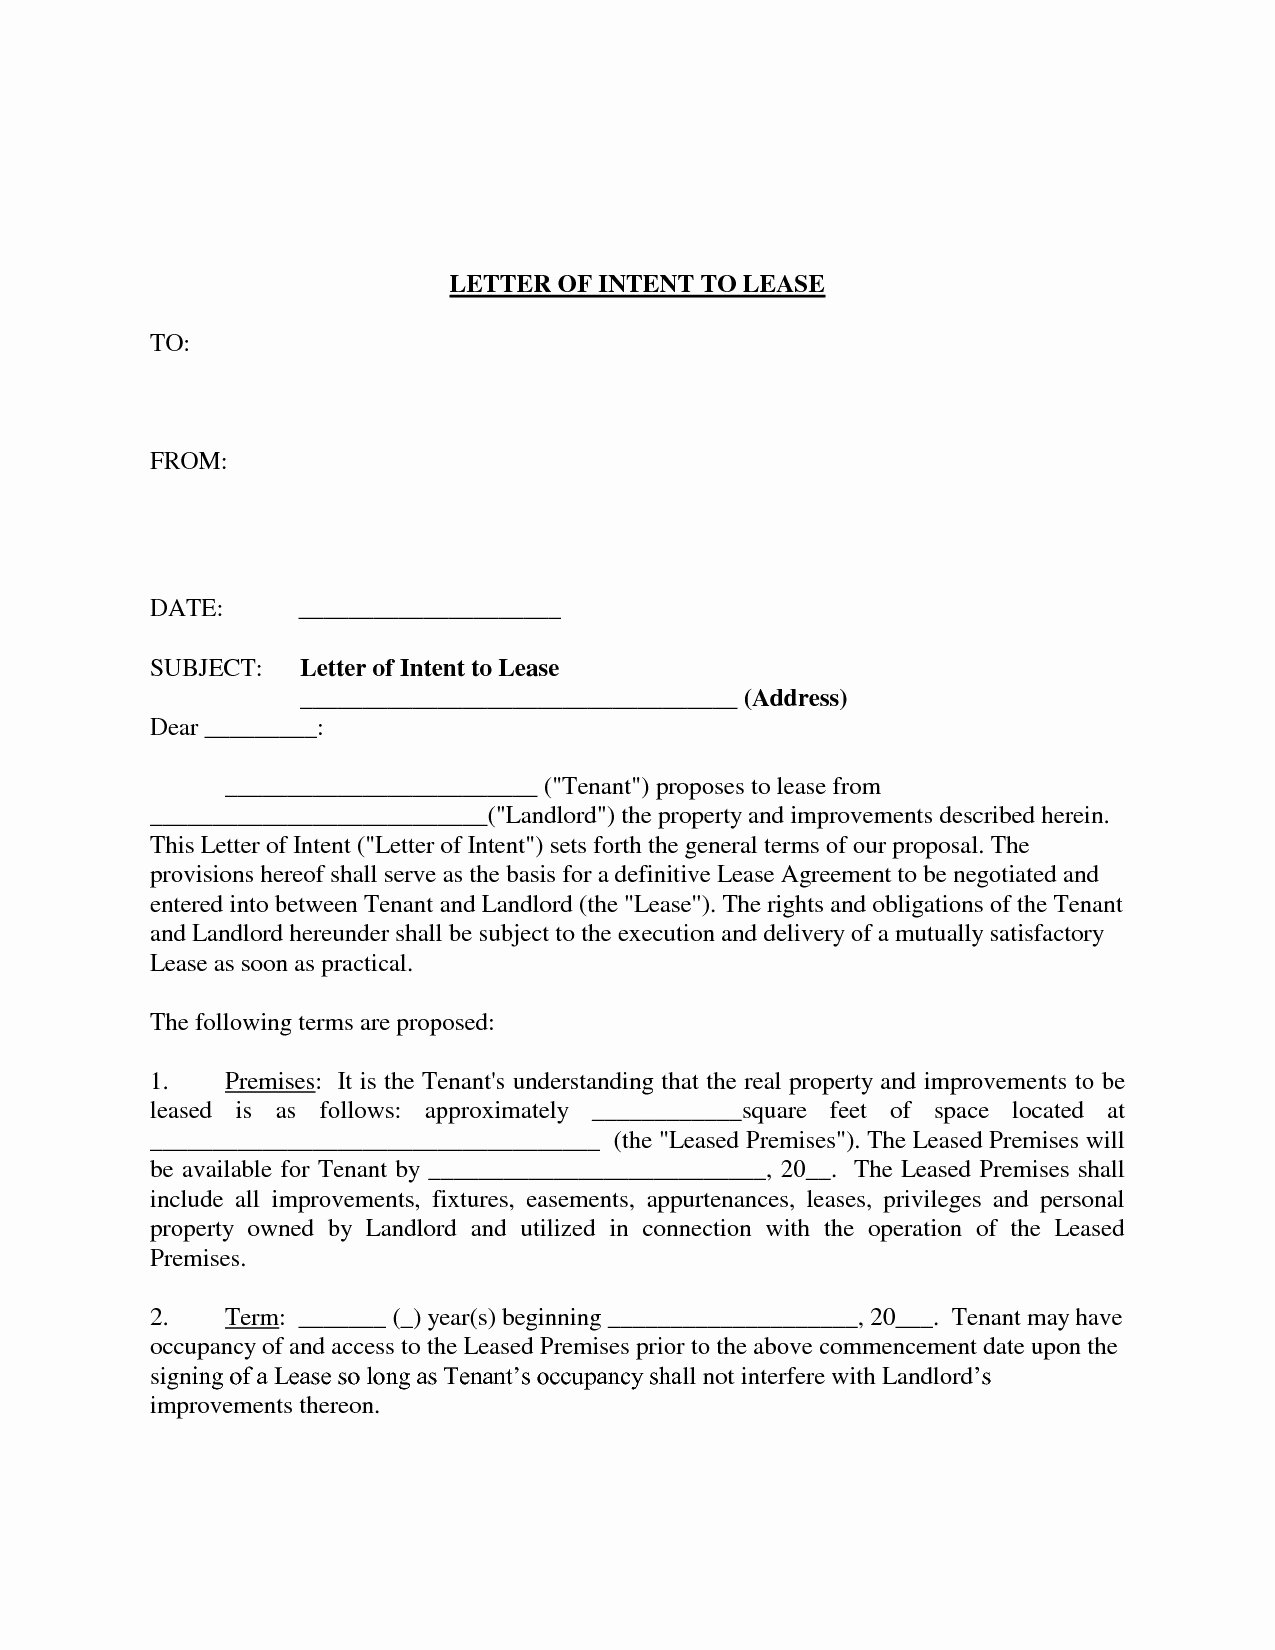 Sample Letter Of Intent to Lease Commercial Retail Space Elegant Georgia Bulldogs Qb Depth Chart – Vinylskivoritusental